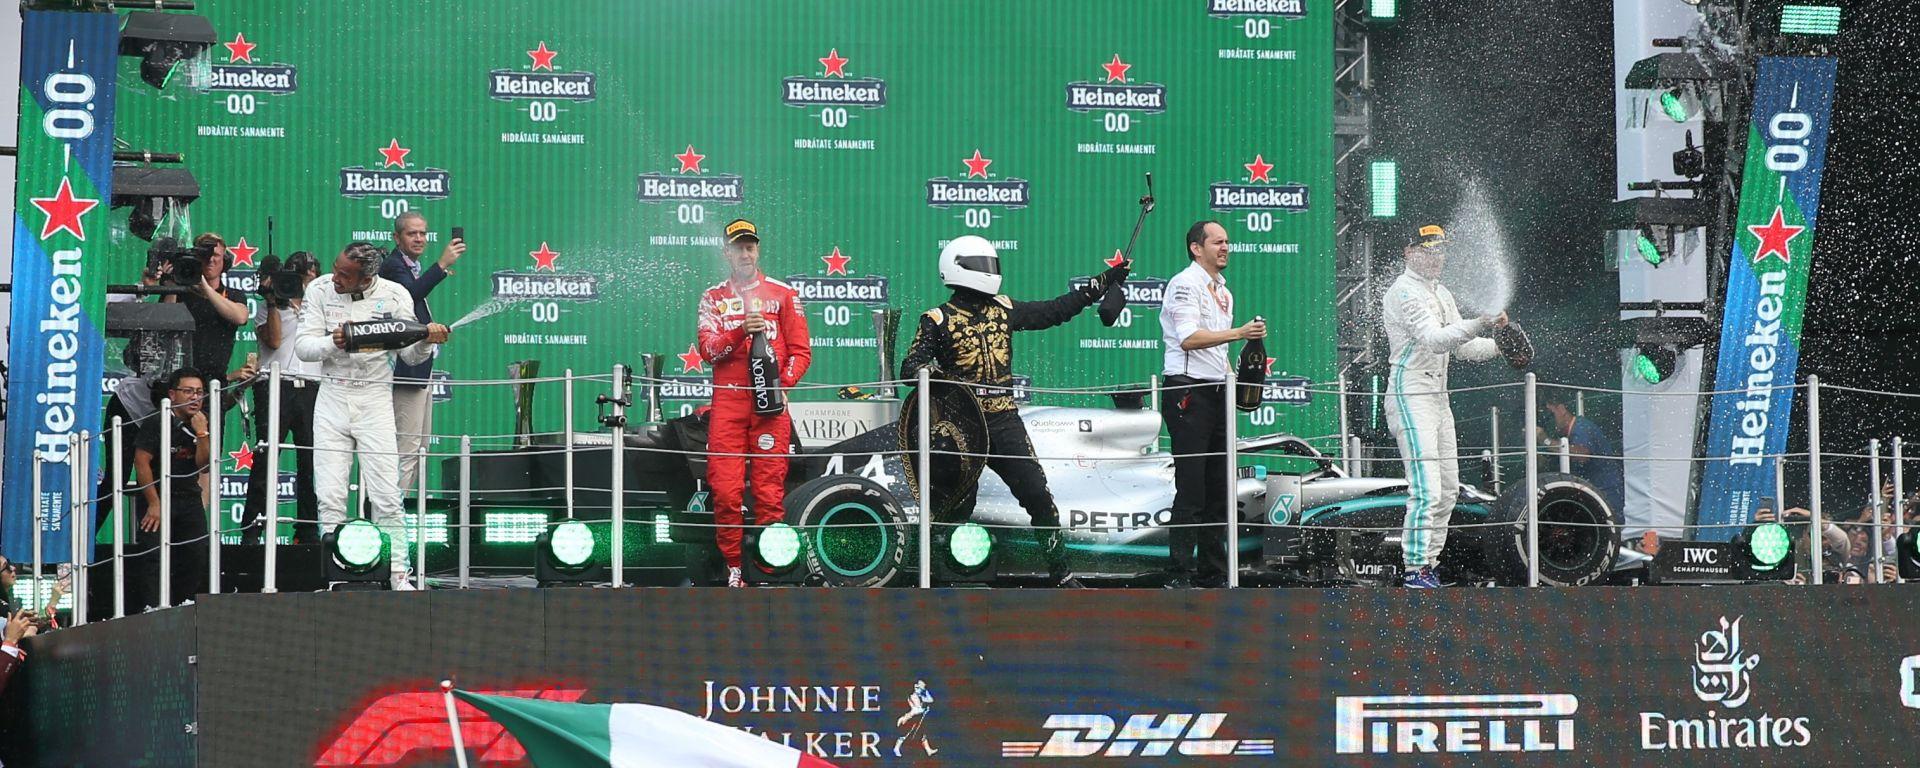 F1, GP Messico 2019: Lewis Hamilton (Mercedes), Sebastian Vettel (Ferrari) e Valtteri Bottas (Mercedes) sul podio con Mario Achi